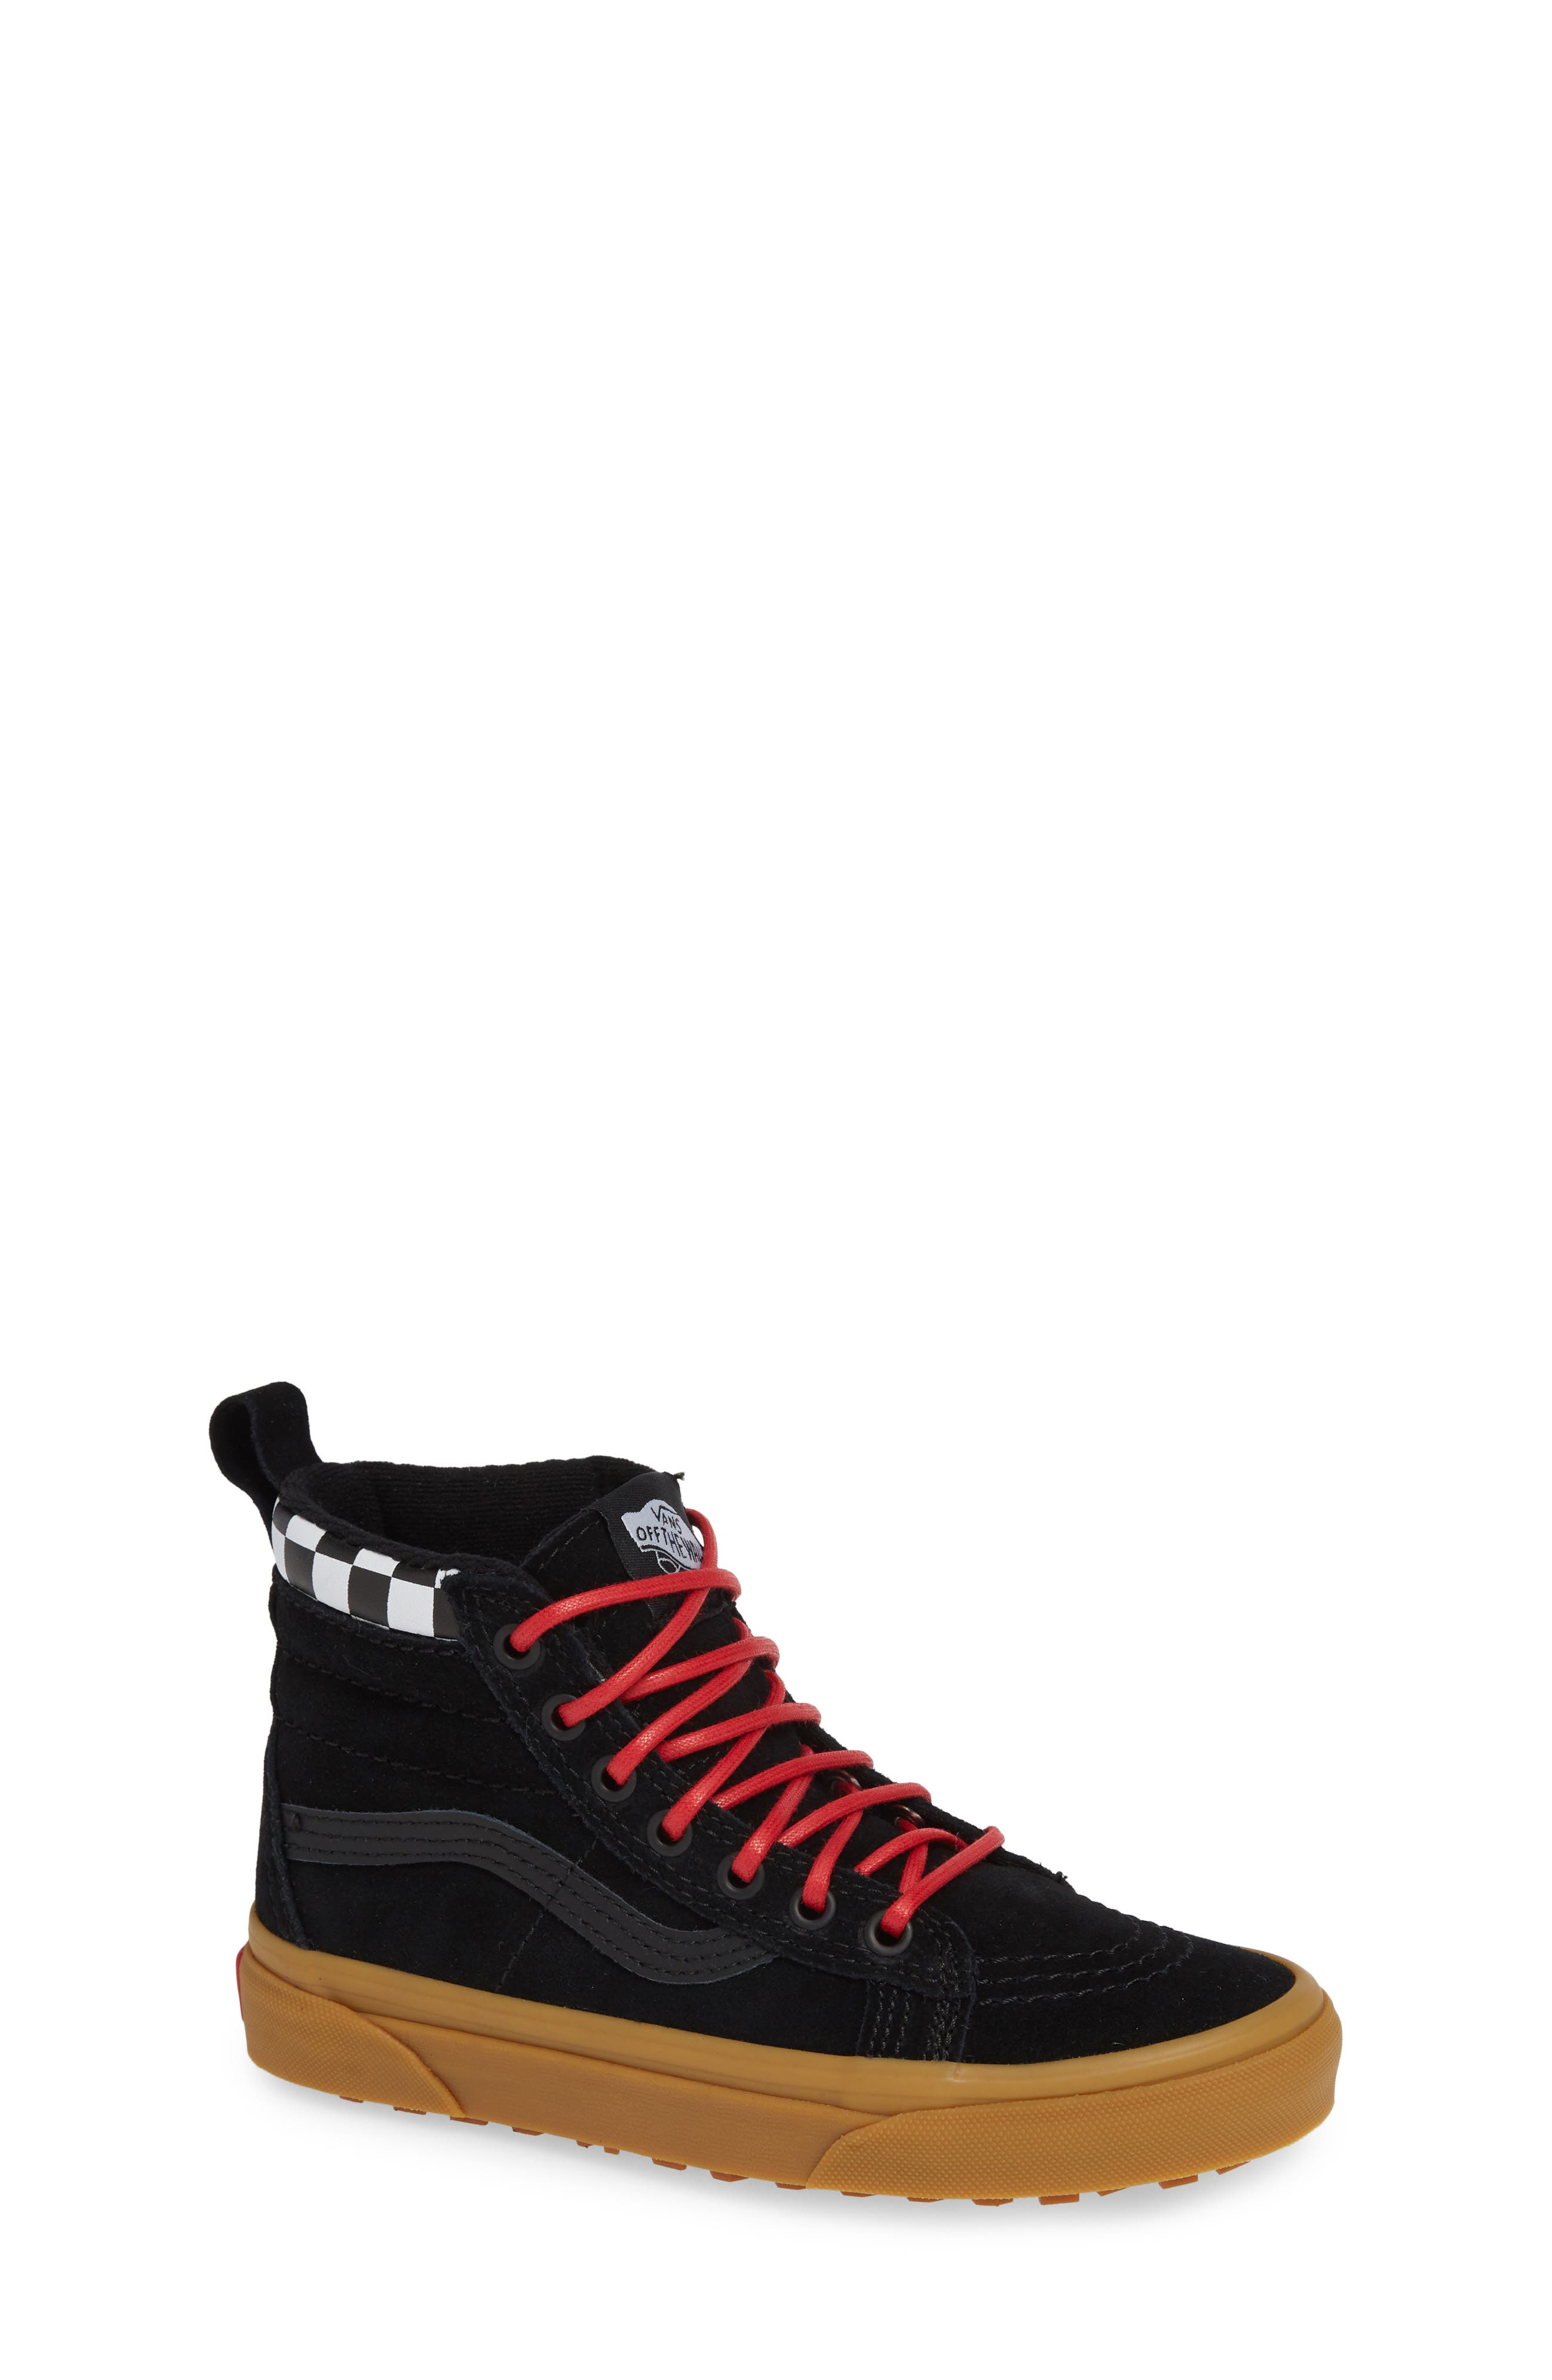 SK8-Hi Sneaker,                             Main thumbnail 1, color,                             CHECKERBOARD/ BLACK